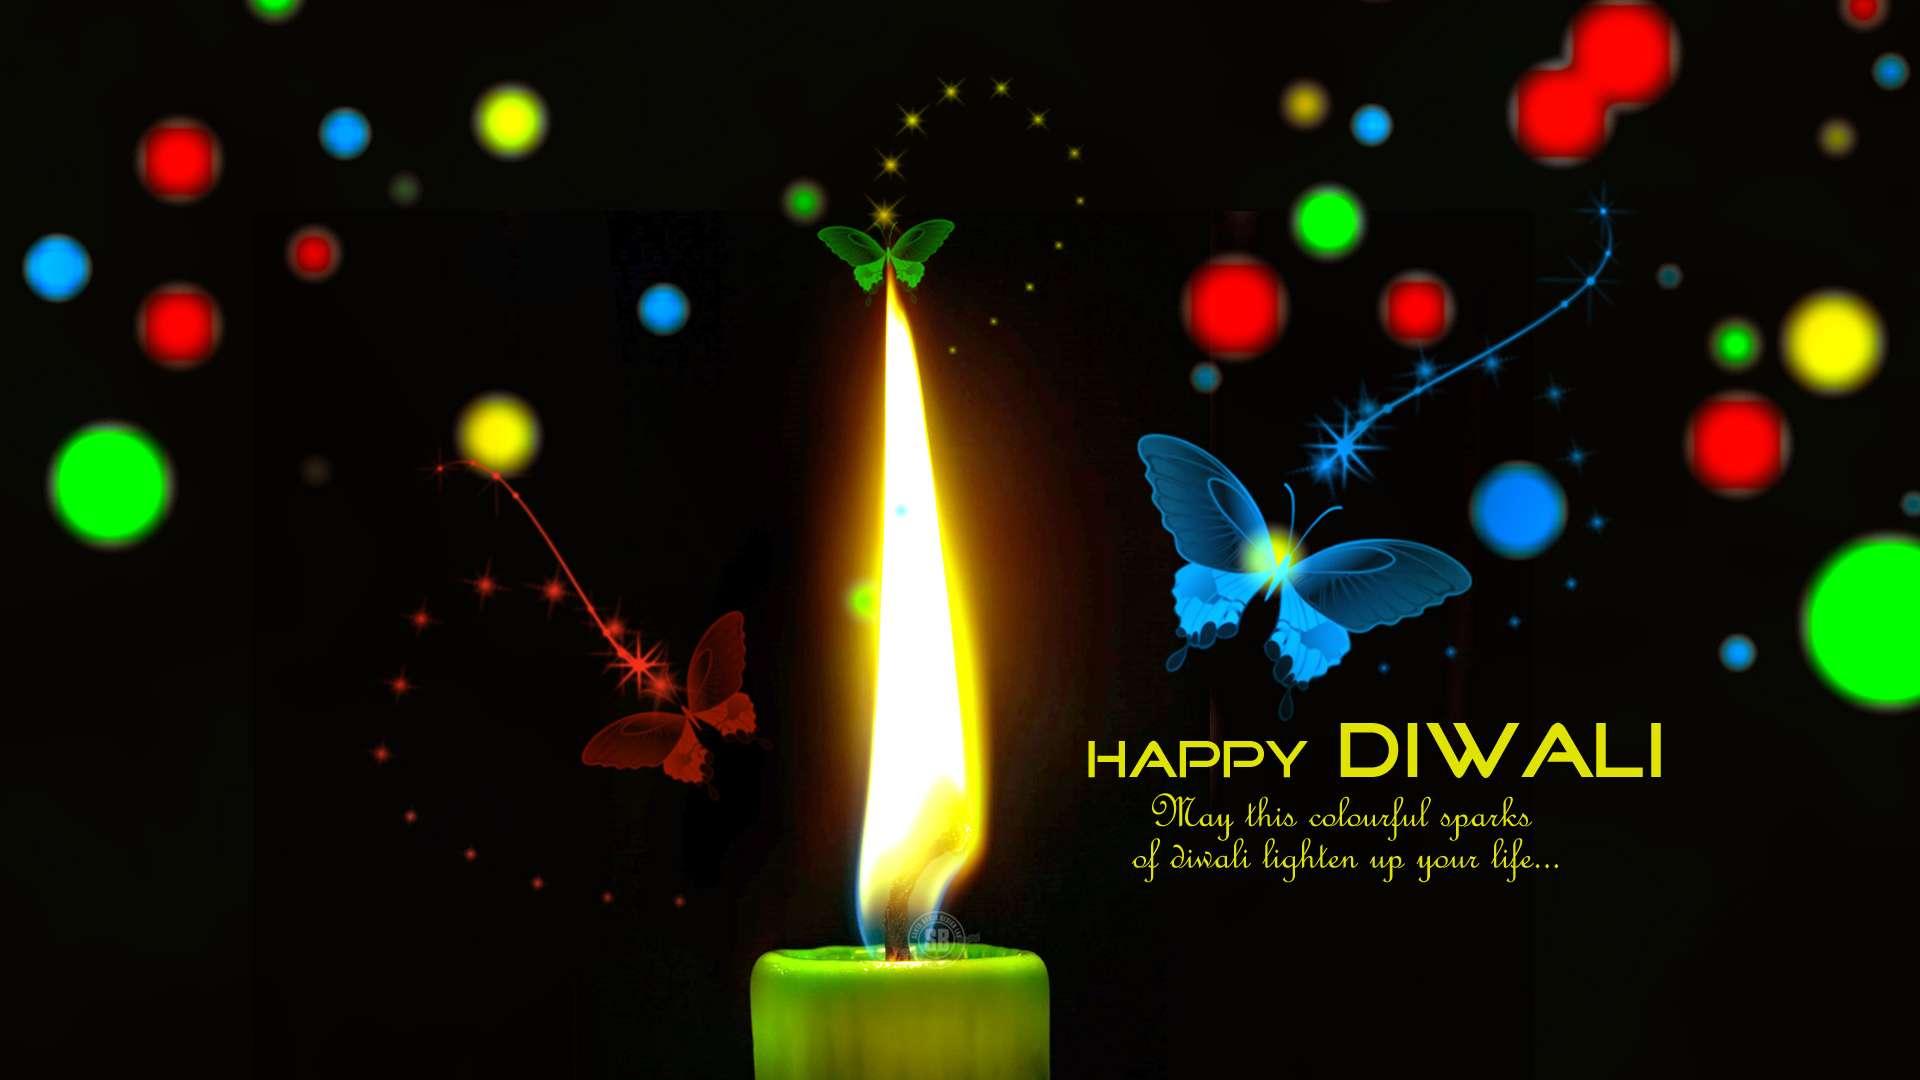 Diwali Wallpapers For Desktop | Live HD Wallpaper HQ Pictures ...